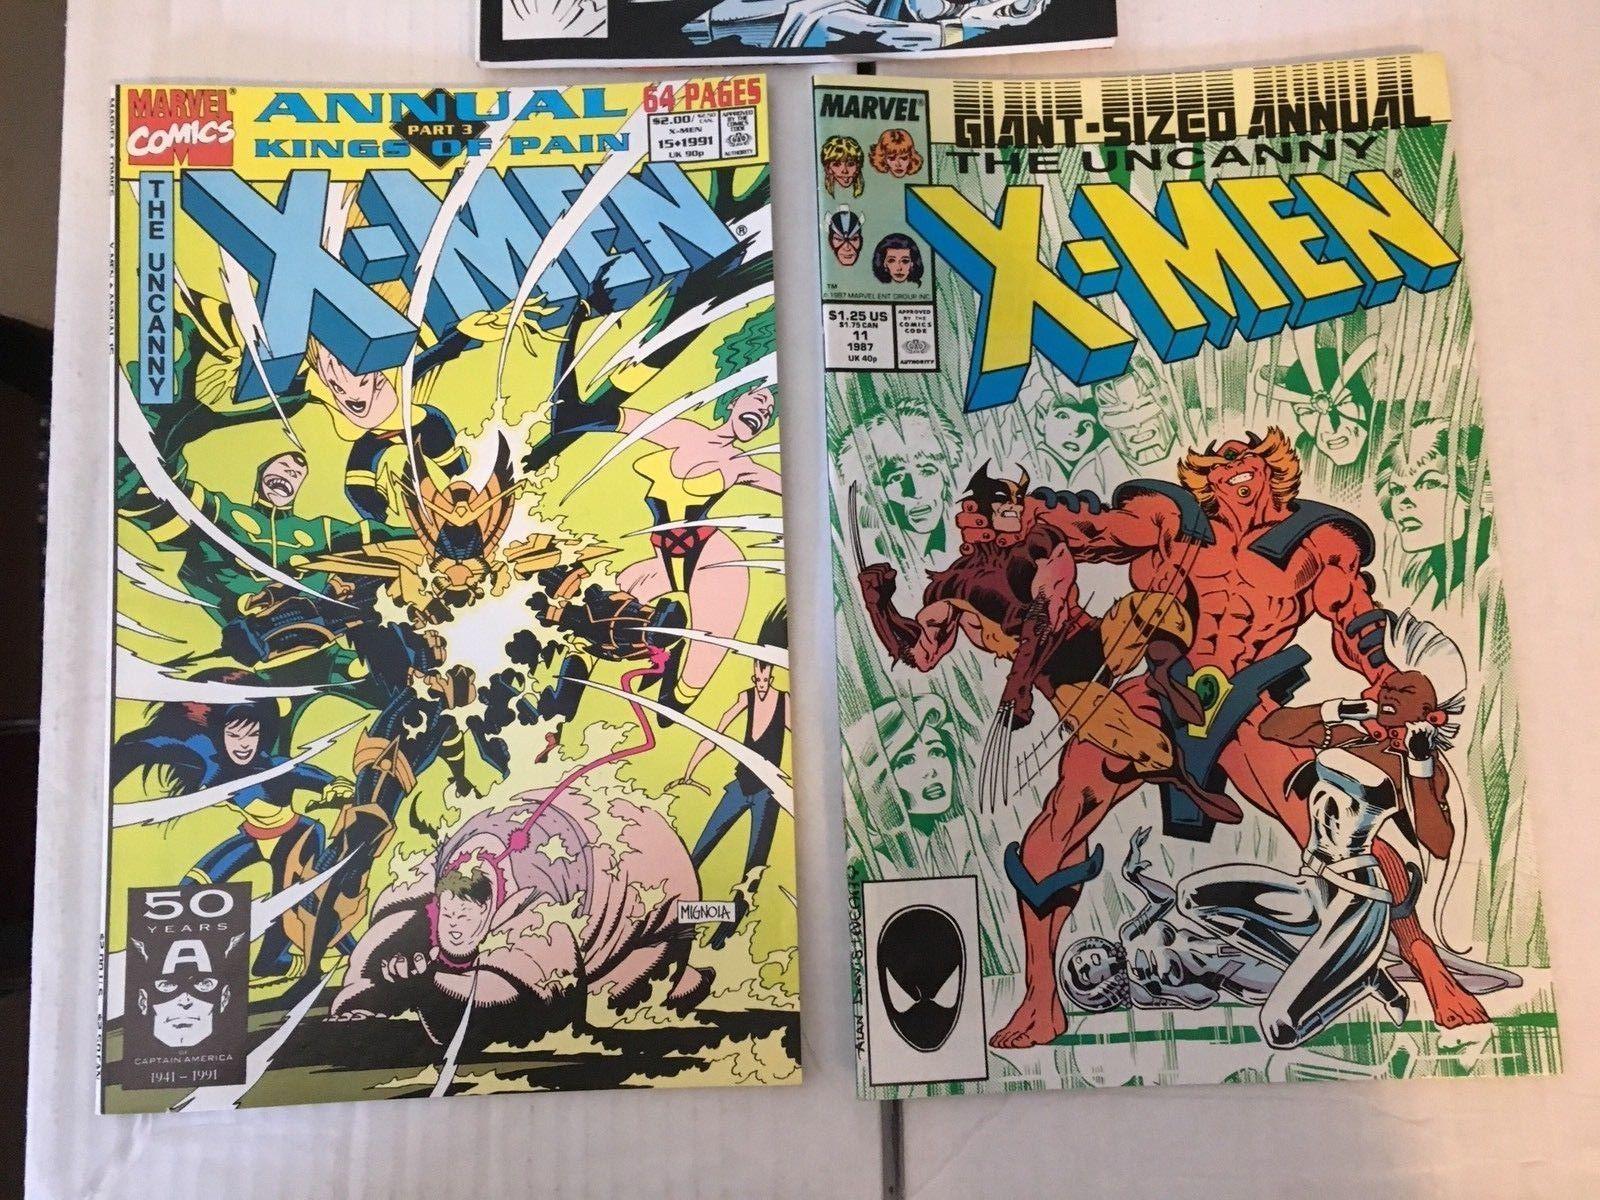 Uncanny X-MEN Annual 11 15 16 Marvel Comic Book Lot Of 3 VF+/NM Condition